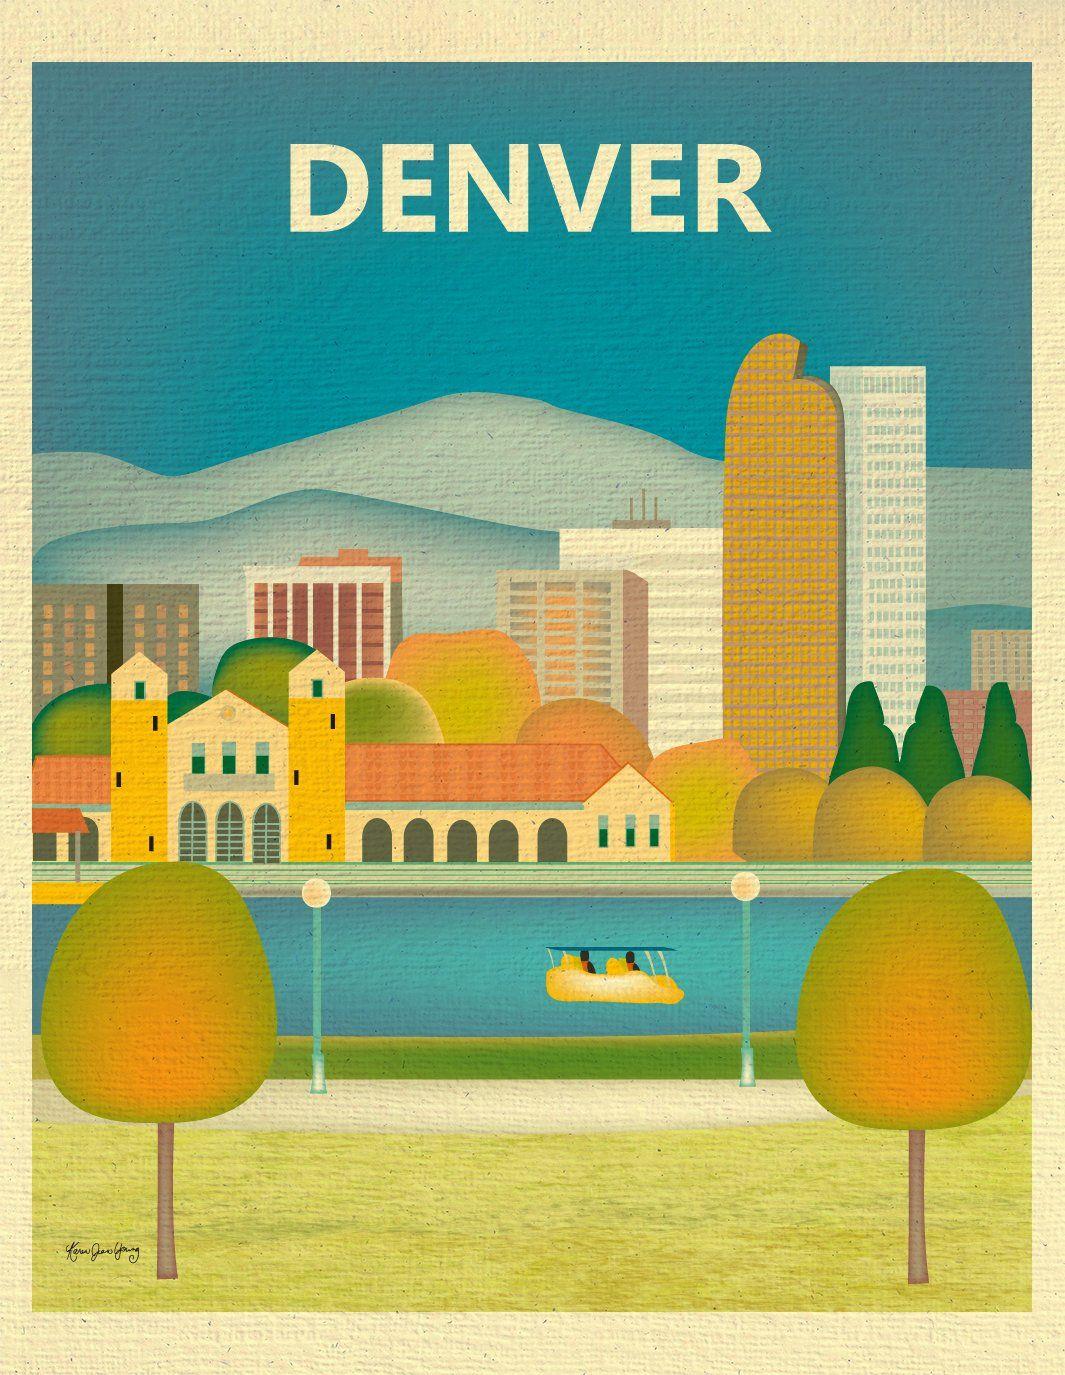 Denver, Colorado - Vertical | Products | Pinterest | Bright color ...